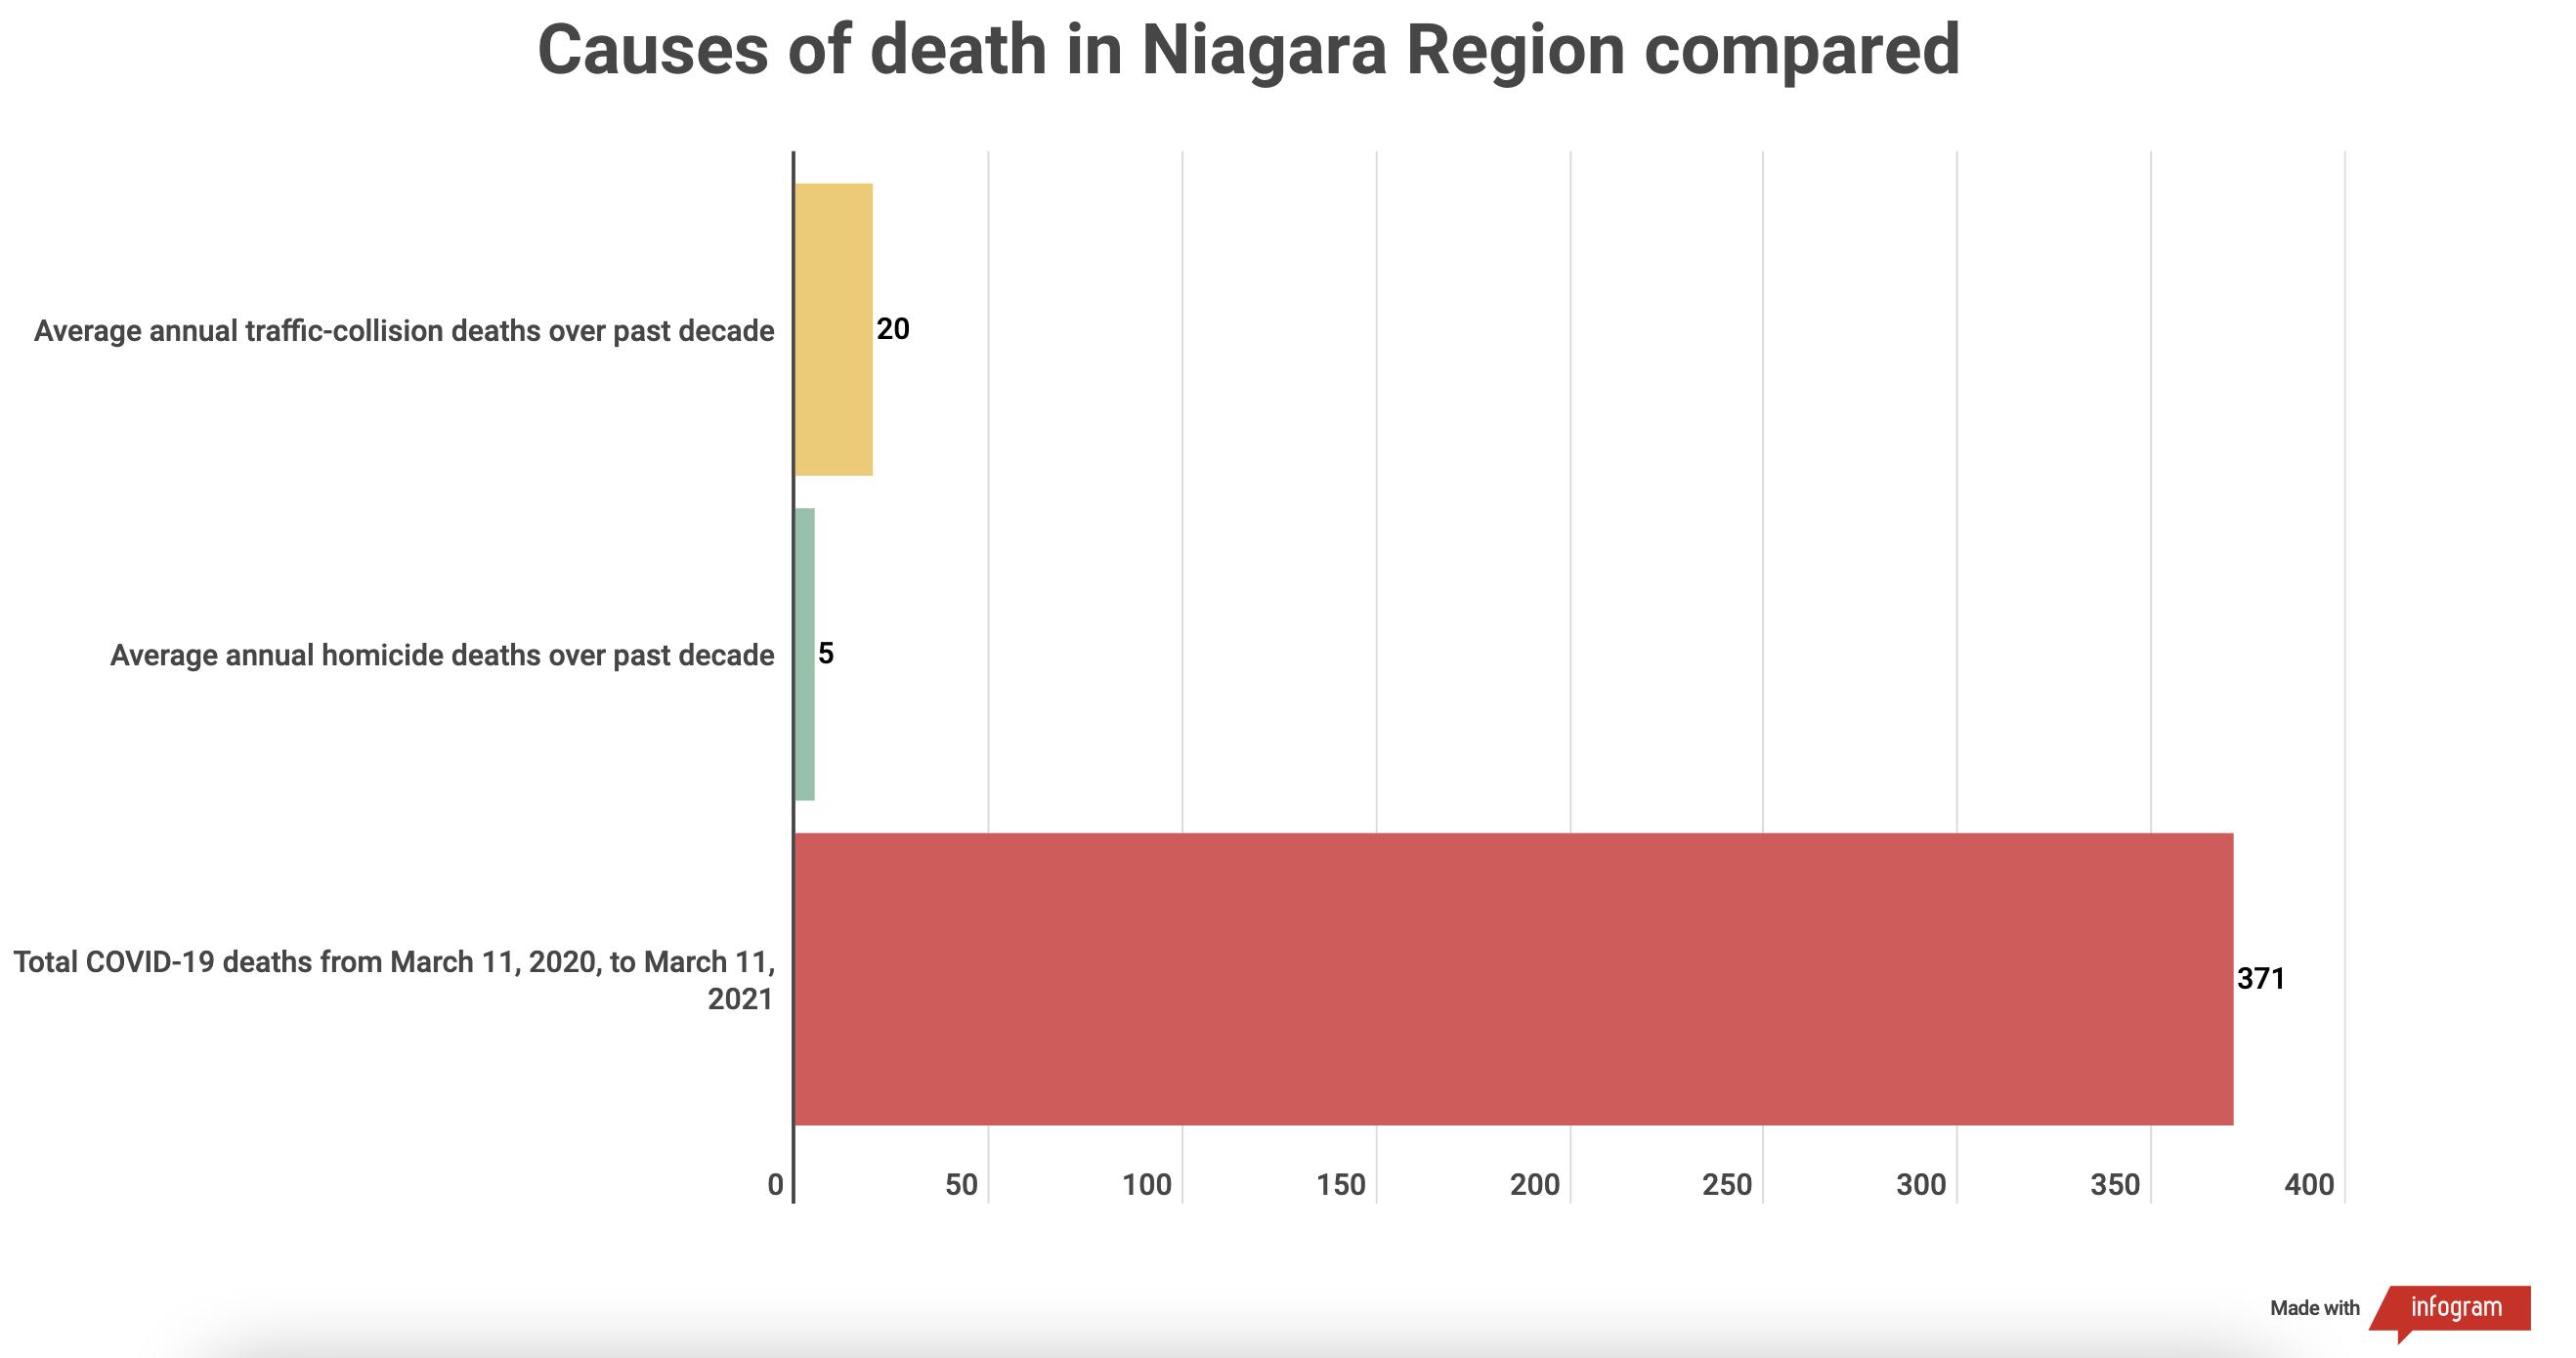 bar chart comparing causes of death in Niagara Region